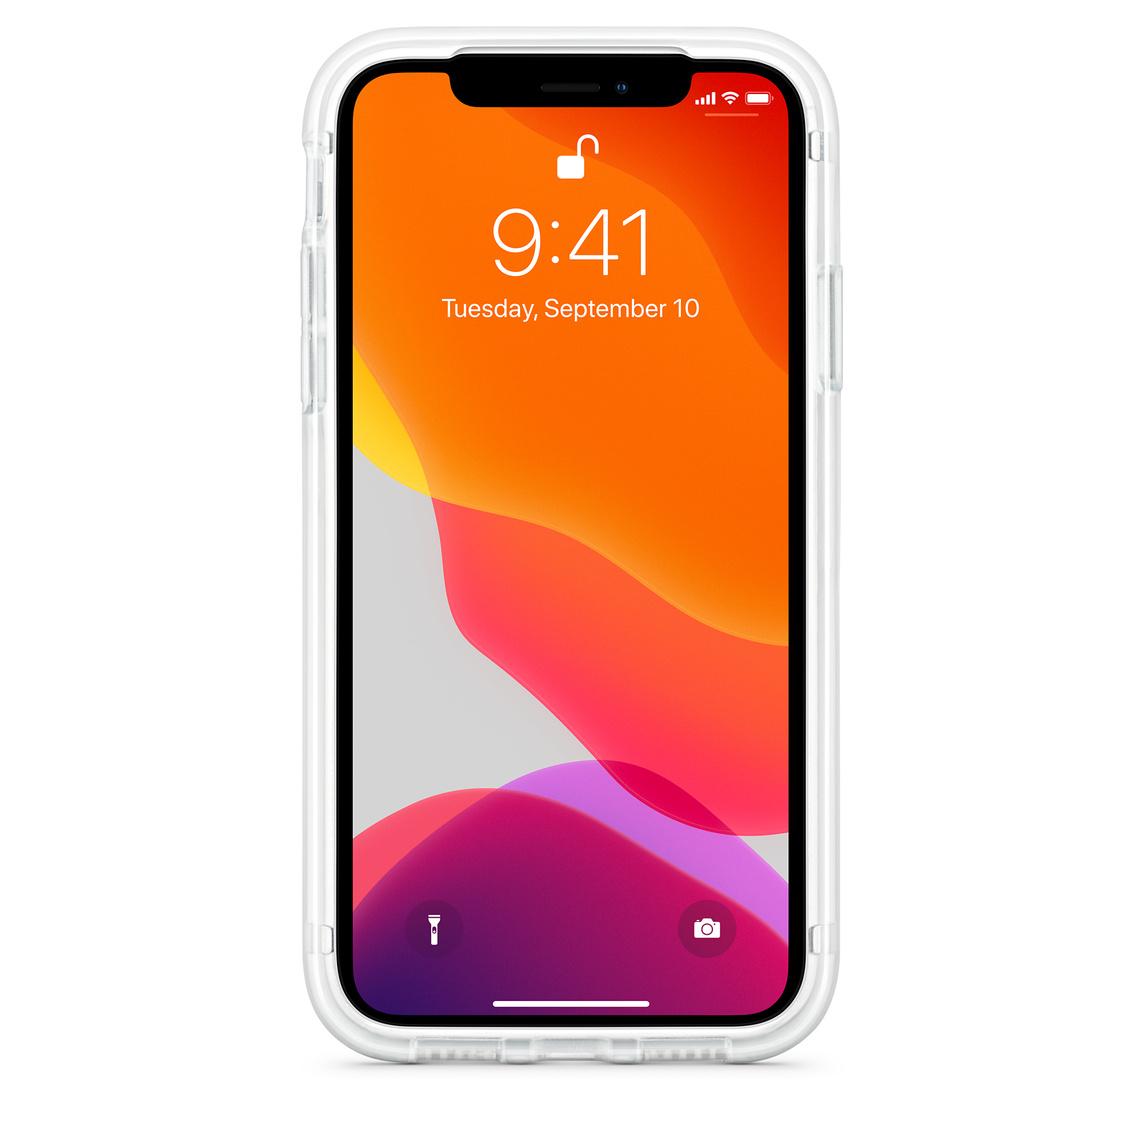 iphone xr seethrough case